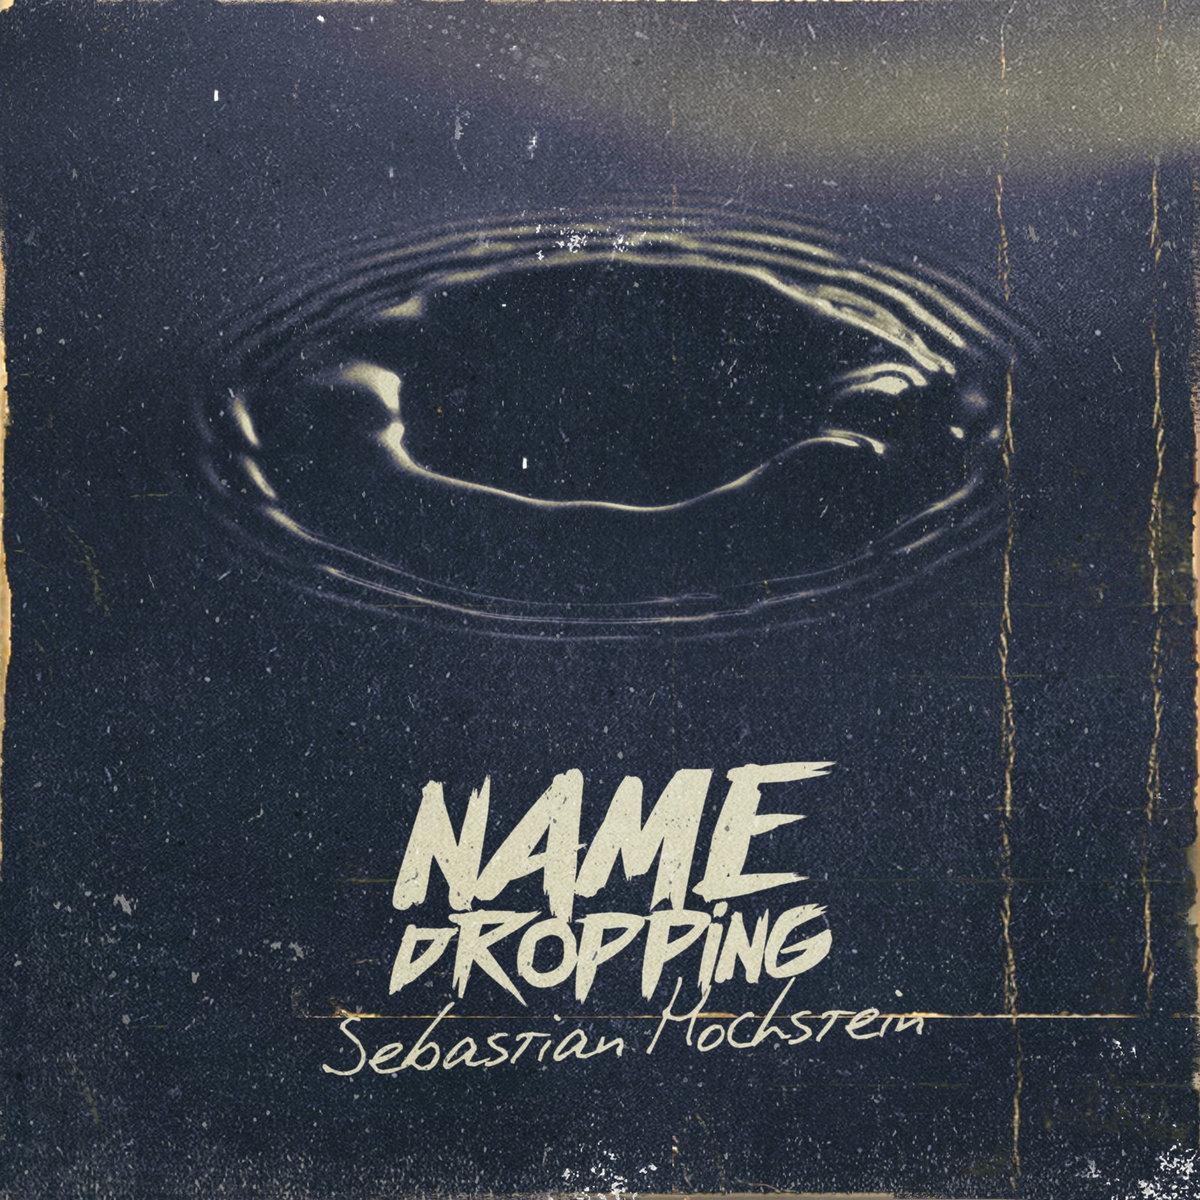 Stream_sebastian_hochstein_presenta_name_dropping